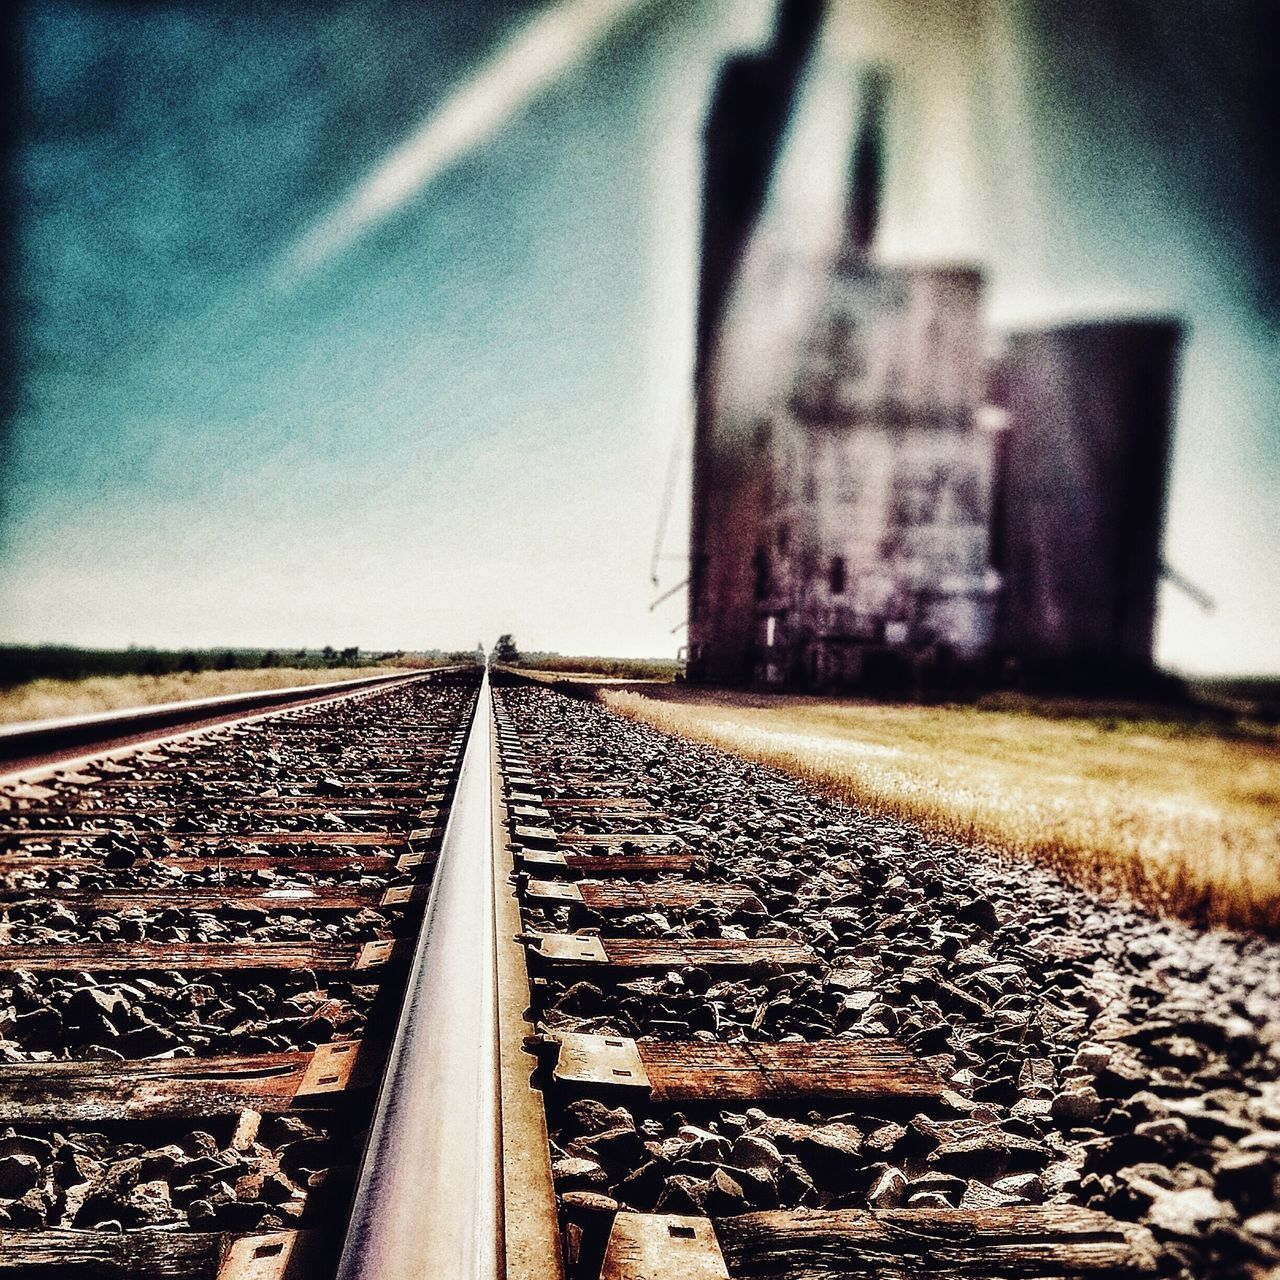 railroad track, rail transportation, transportation, metal, no people, day, railroad tie, the way forward, outdoors, public transportation, railroad, clear sky, sky, close-up